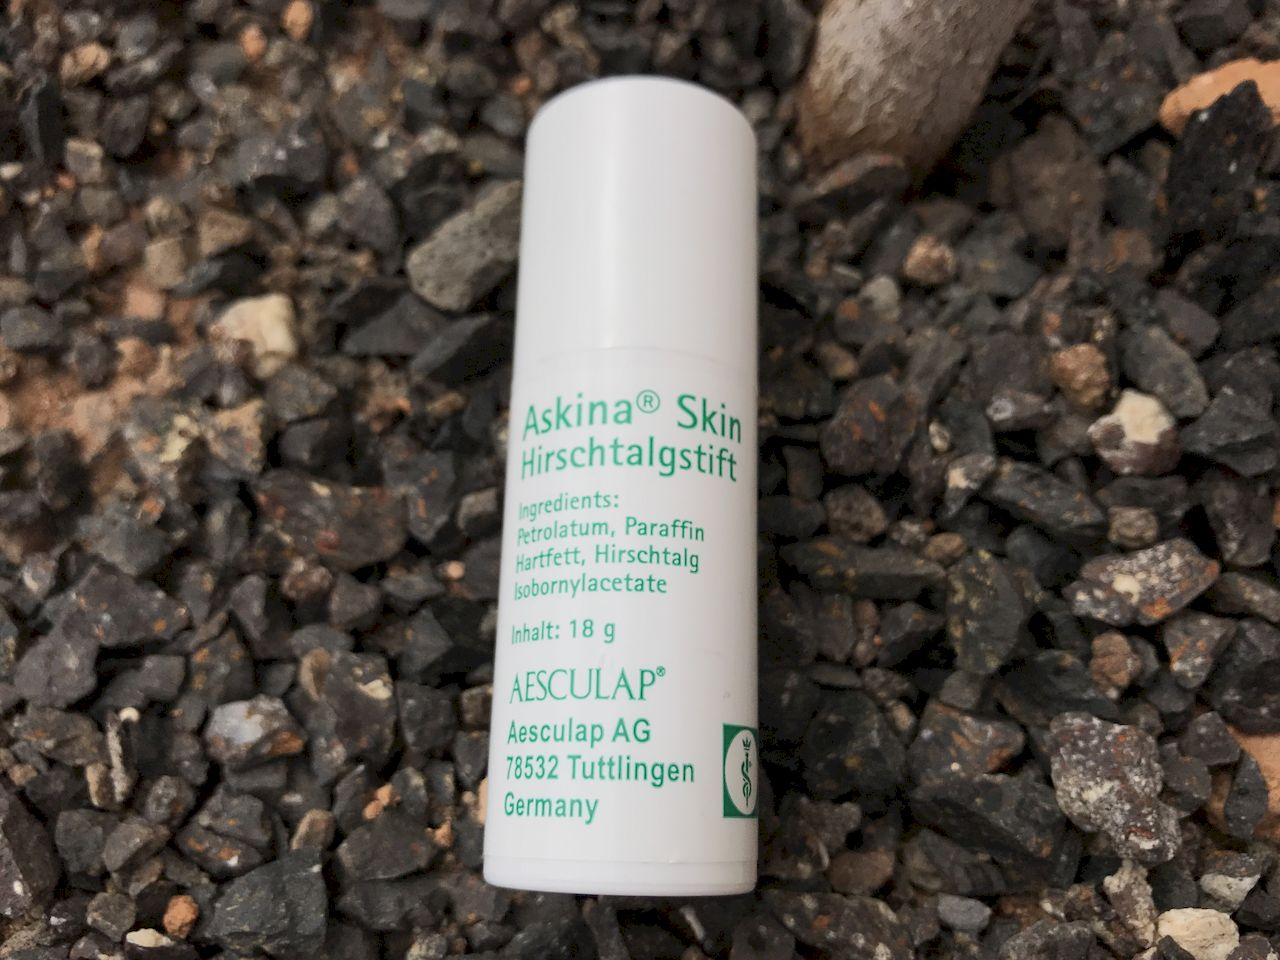 Askina-Hirschtalgstift verhindert Wundscheuern